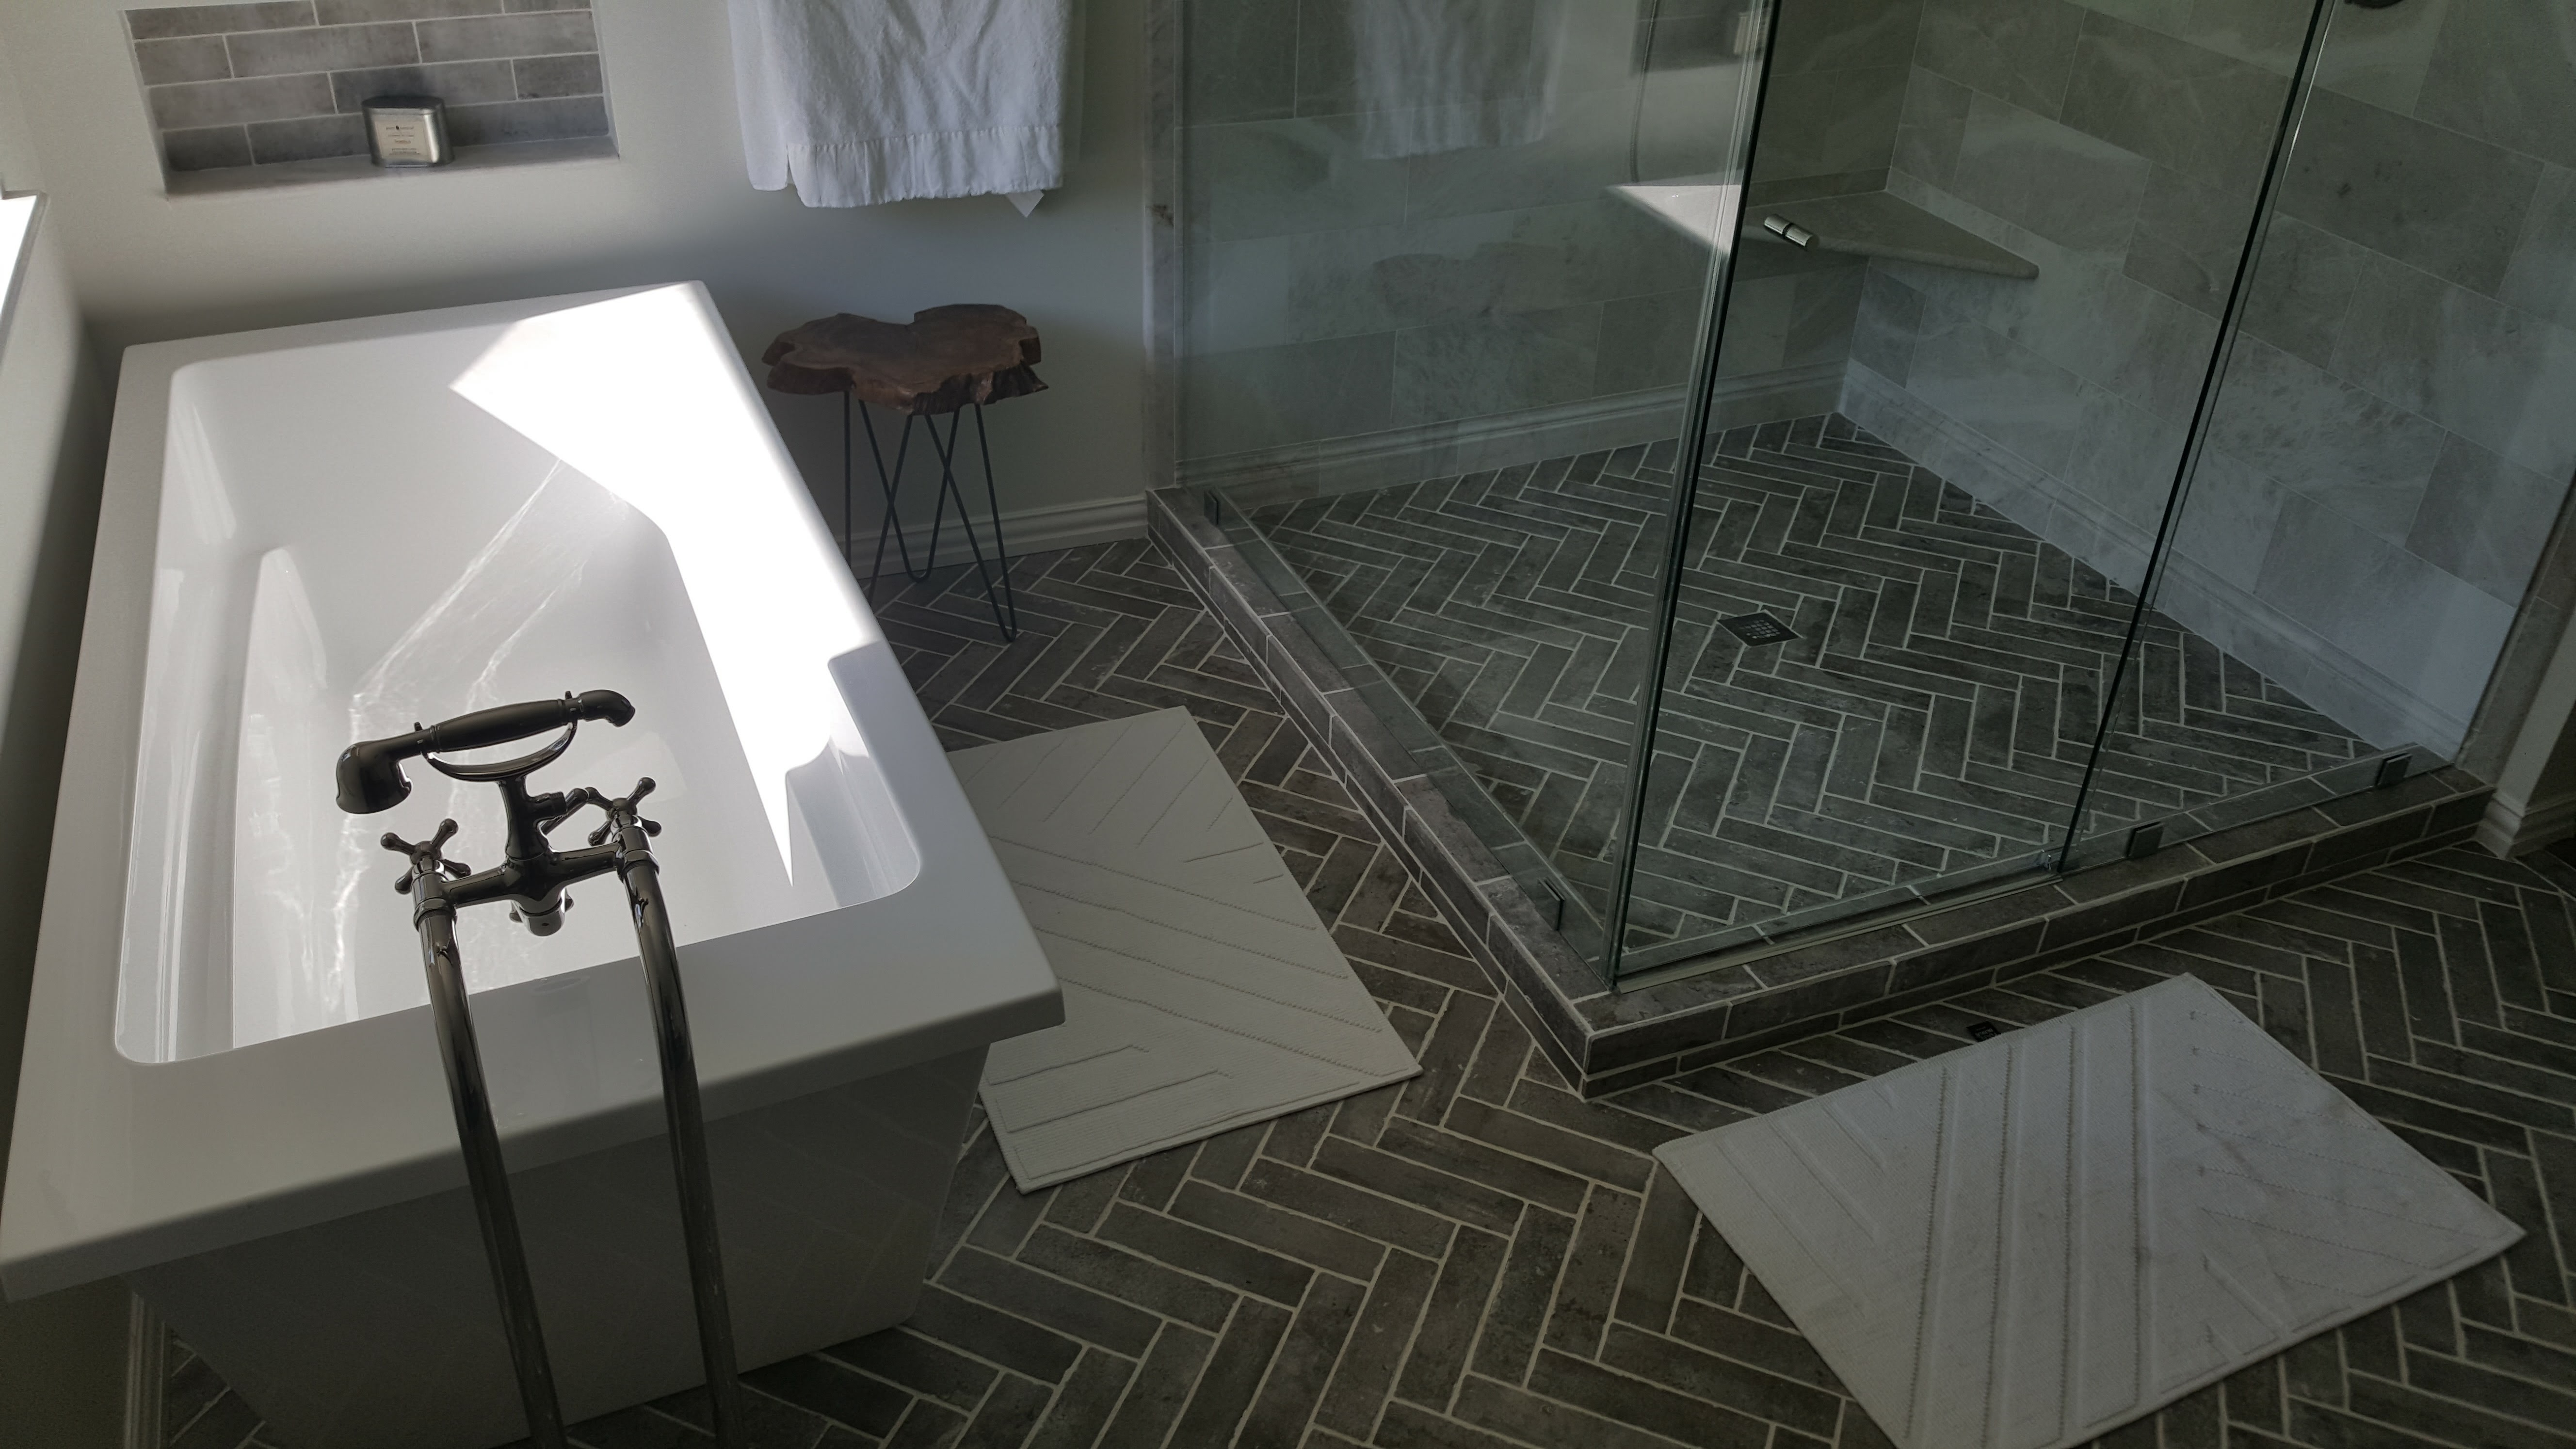 Bathroom remodel with herringbone brick floors, marble tiles and custom glass